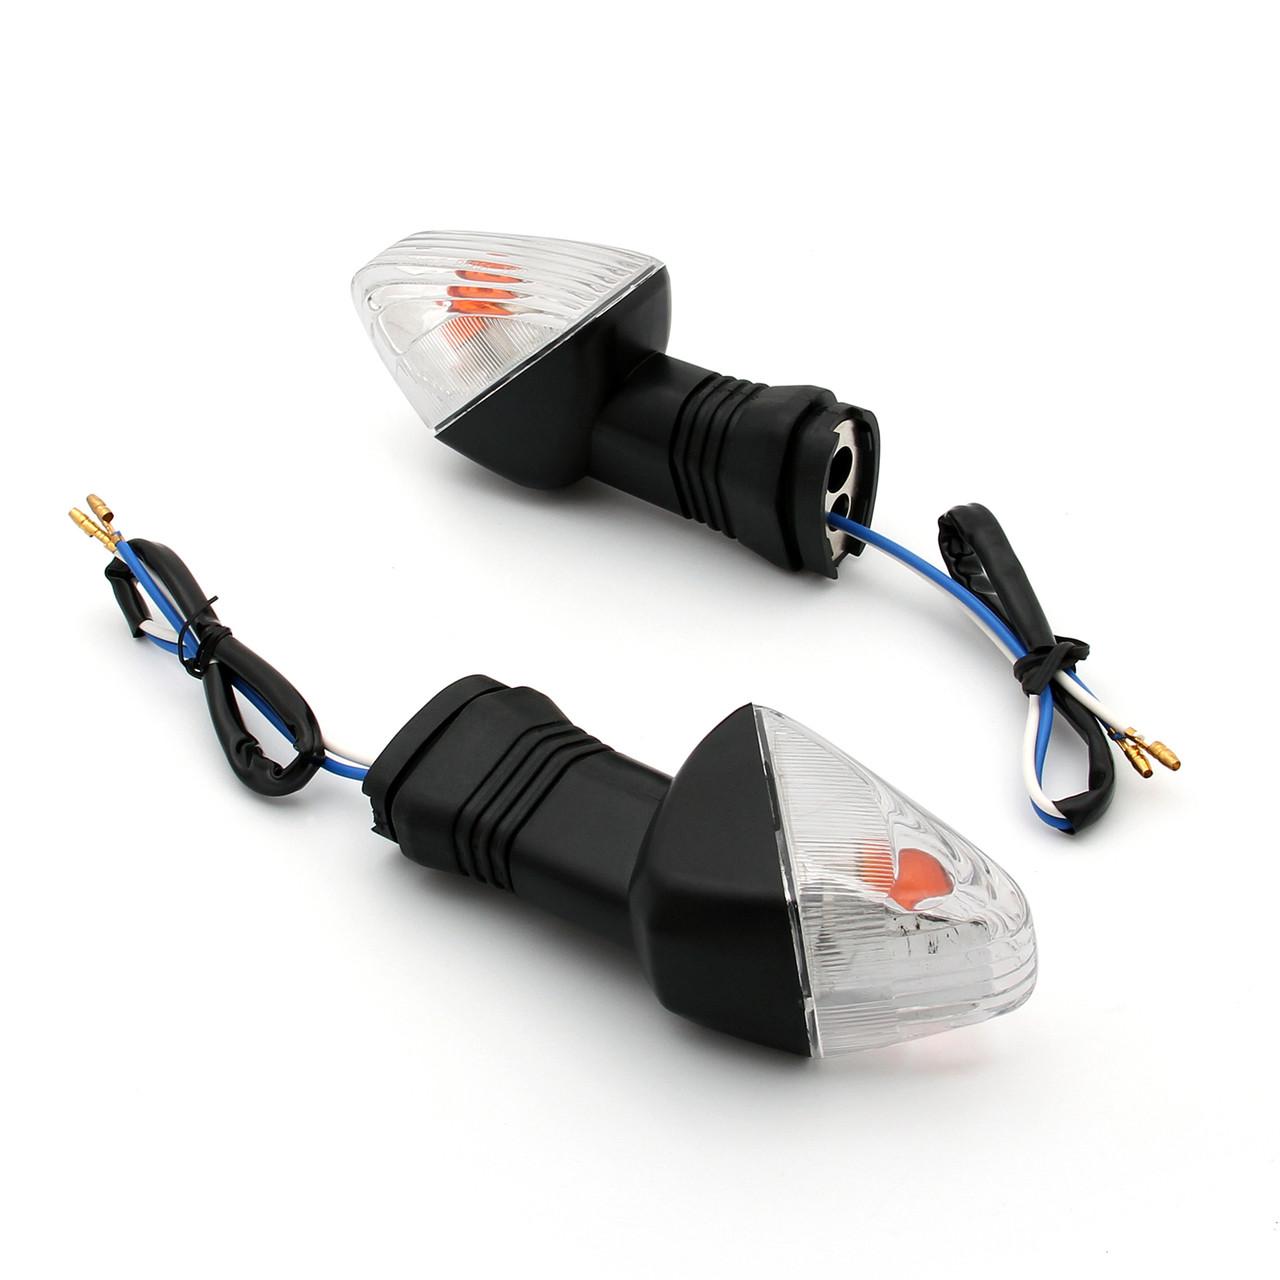 http://www.madhornets.store/AMZ/MotoPart/Turn Signals/TS-ZX6R-0911/TS-ZX6R-0911-Clear-3.jpg